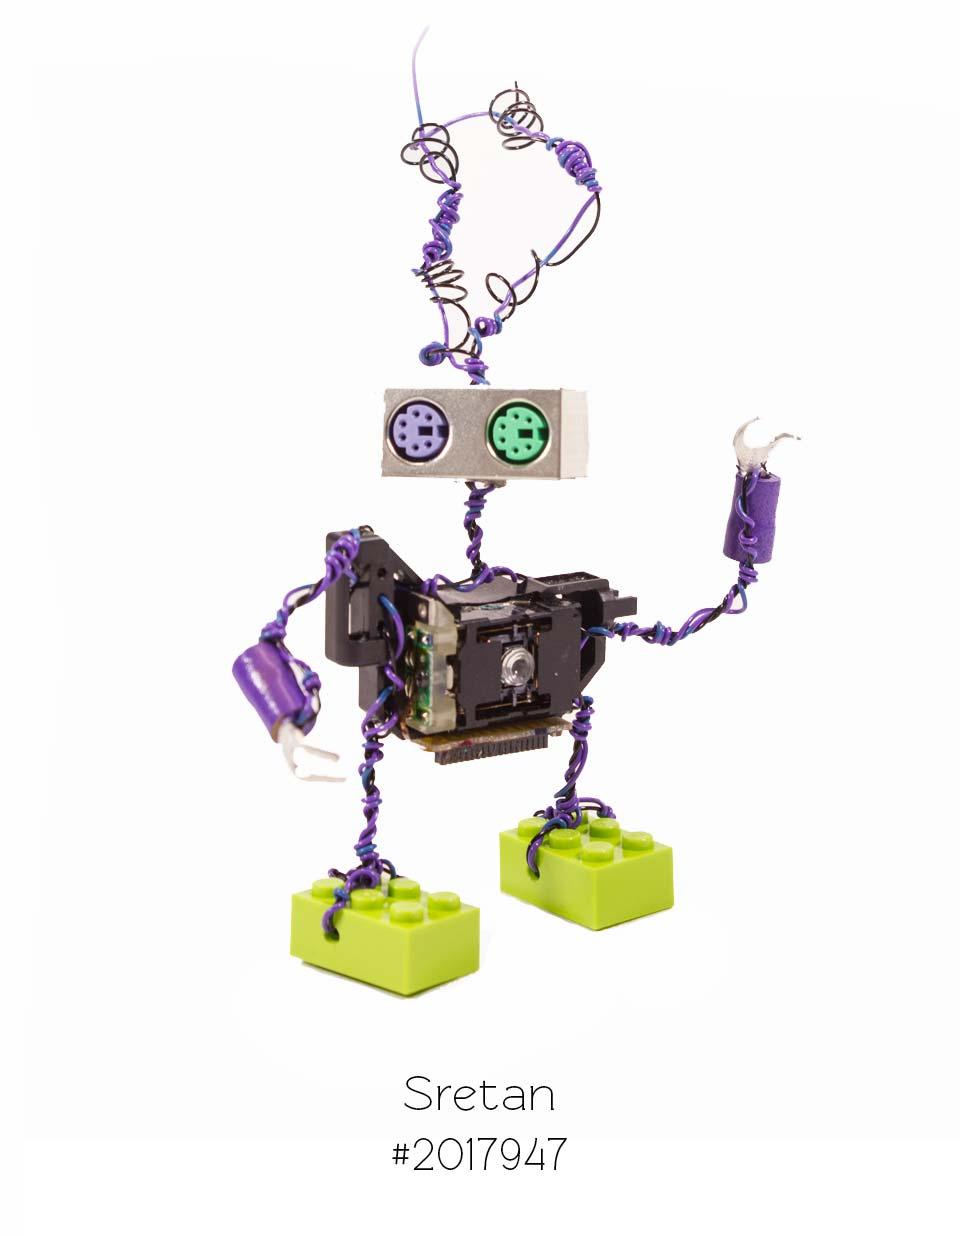 bots-10